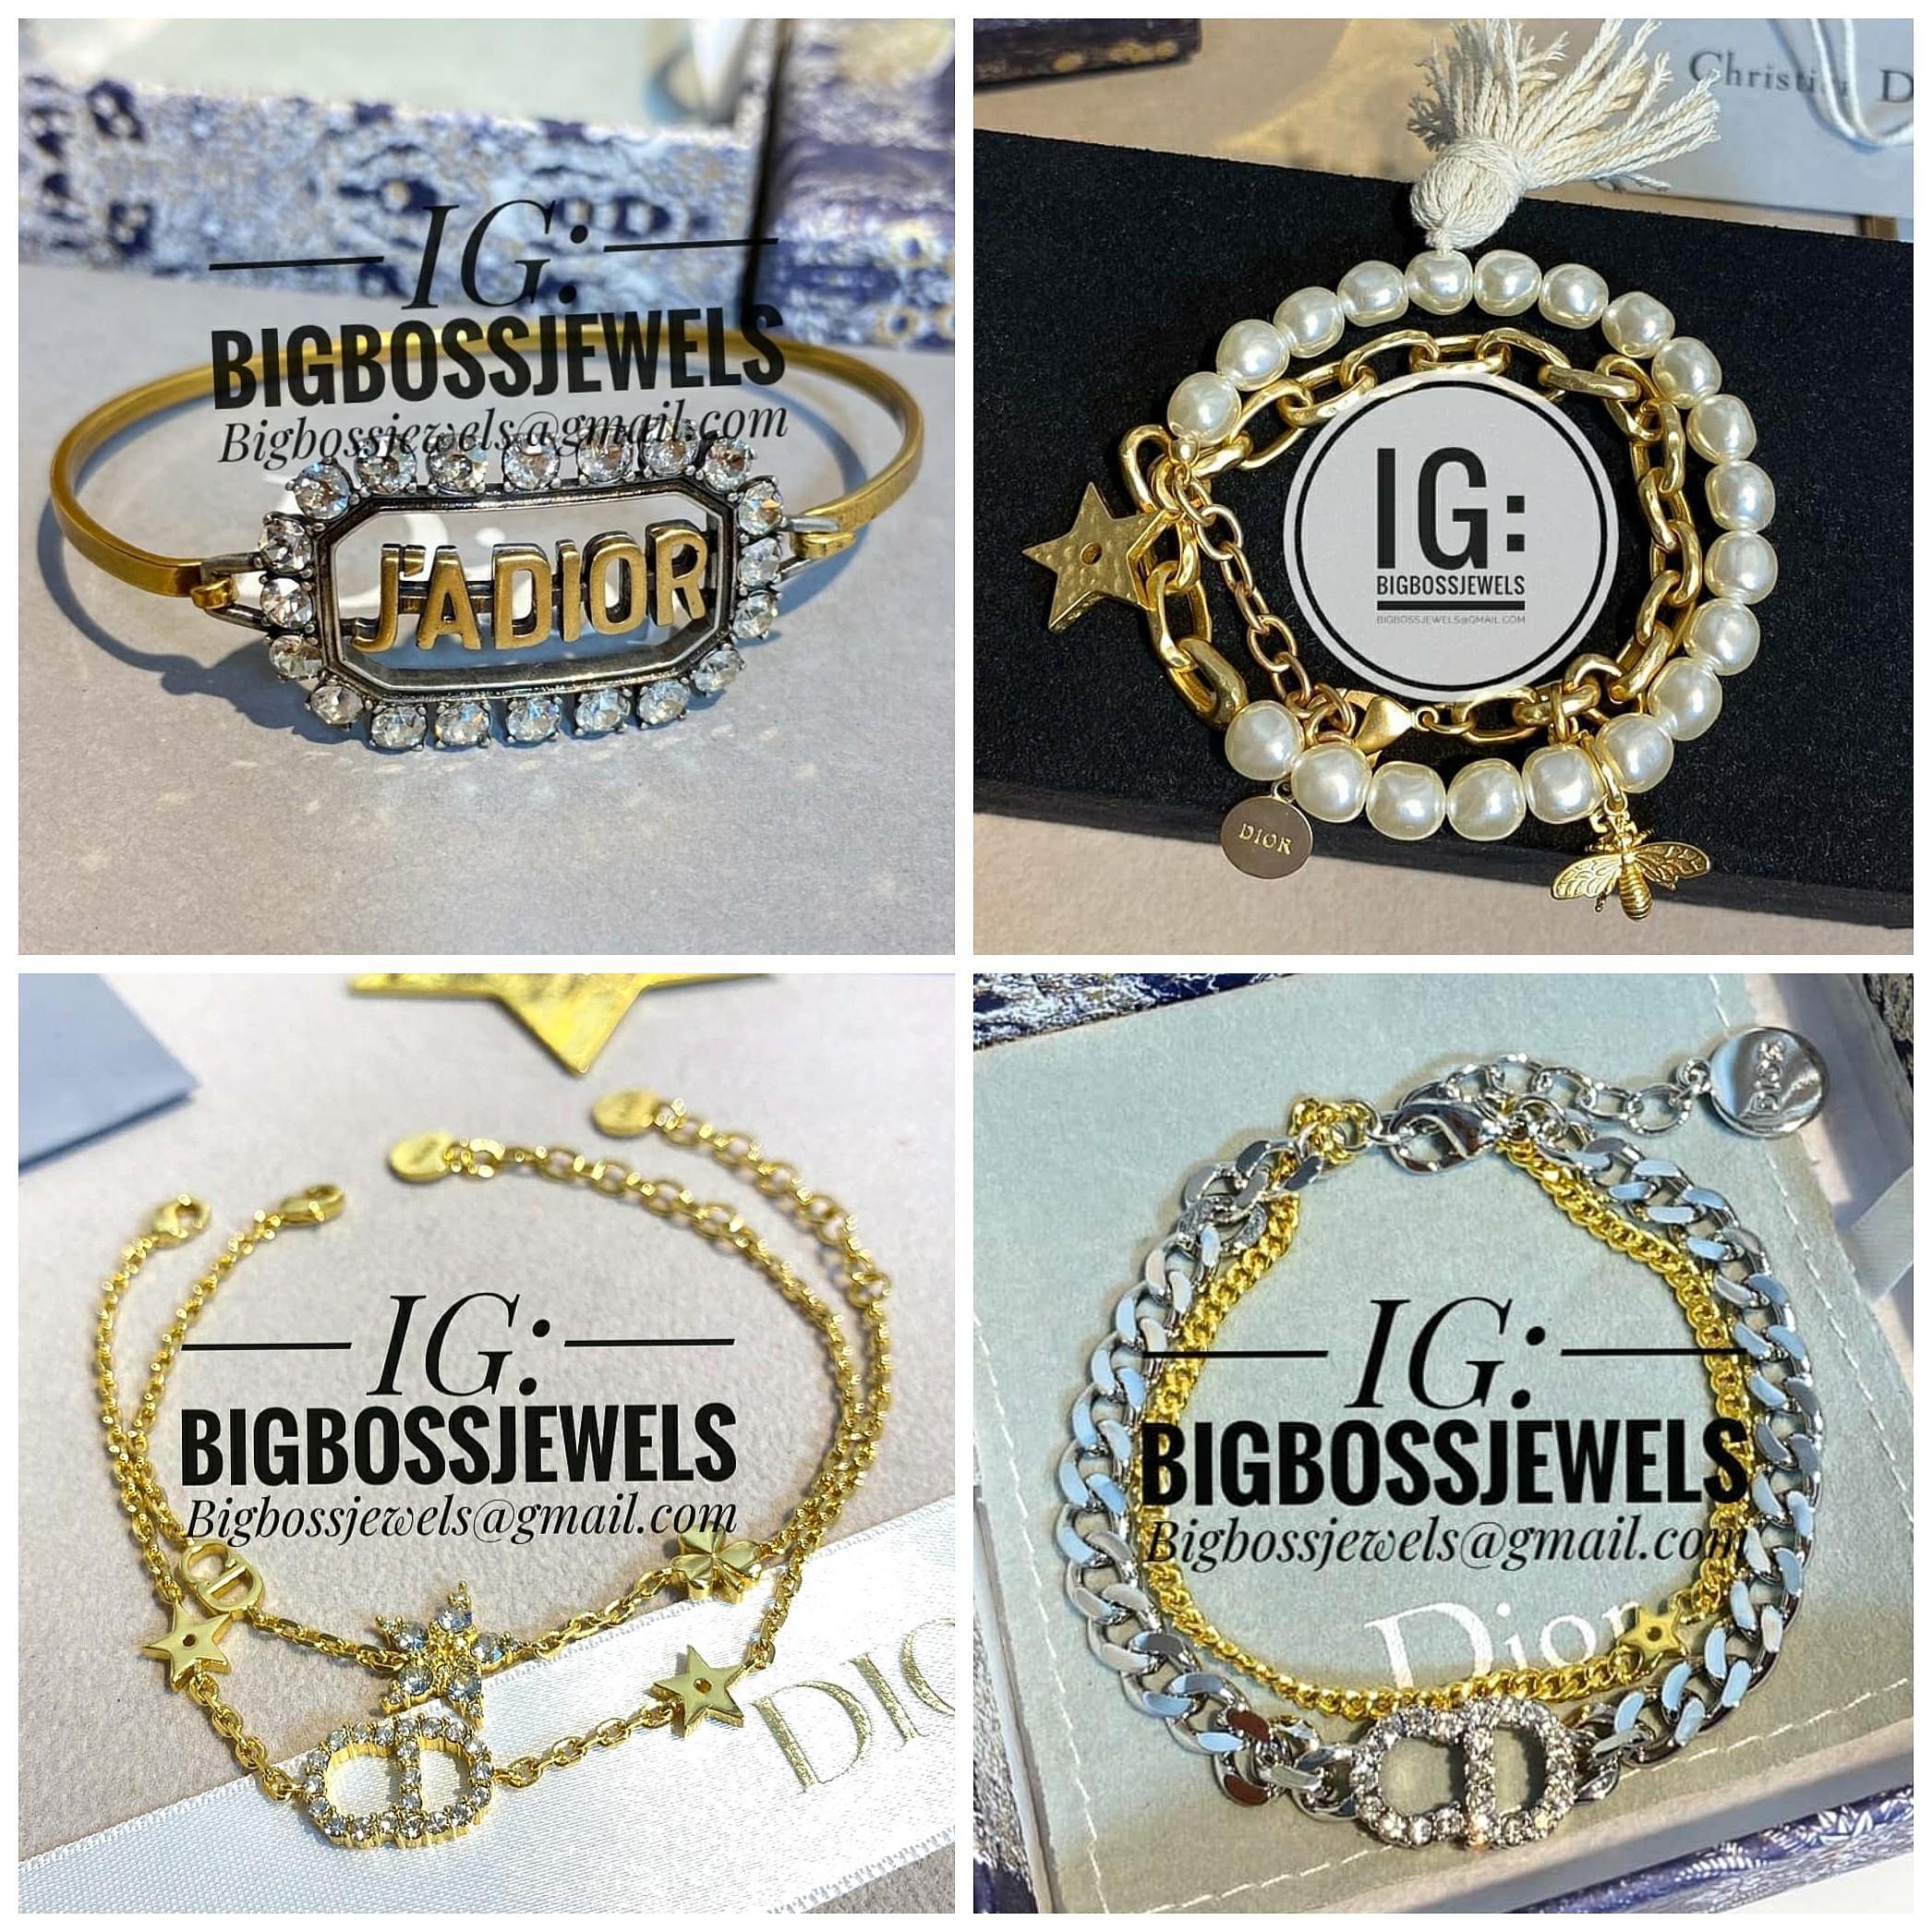 Bracelet Bangle Gold Rose Gold Silver Swarovski Diamond Like Crystals Jadior Pearl Chain Cuff 12 Zodiac Earrings Women S Fashion Jewellery Bracelets On Carousell